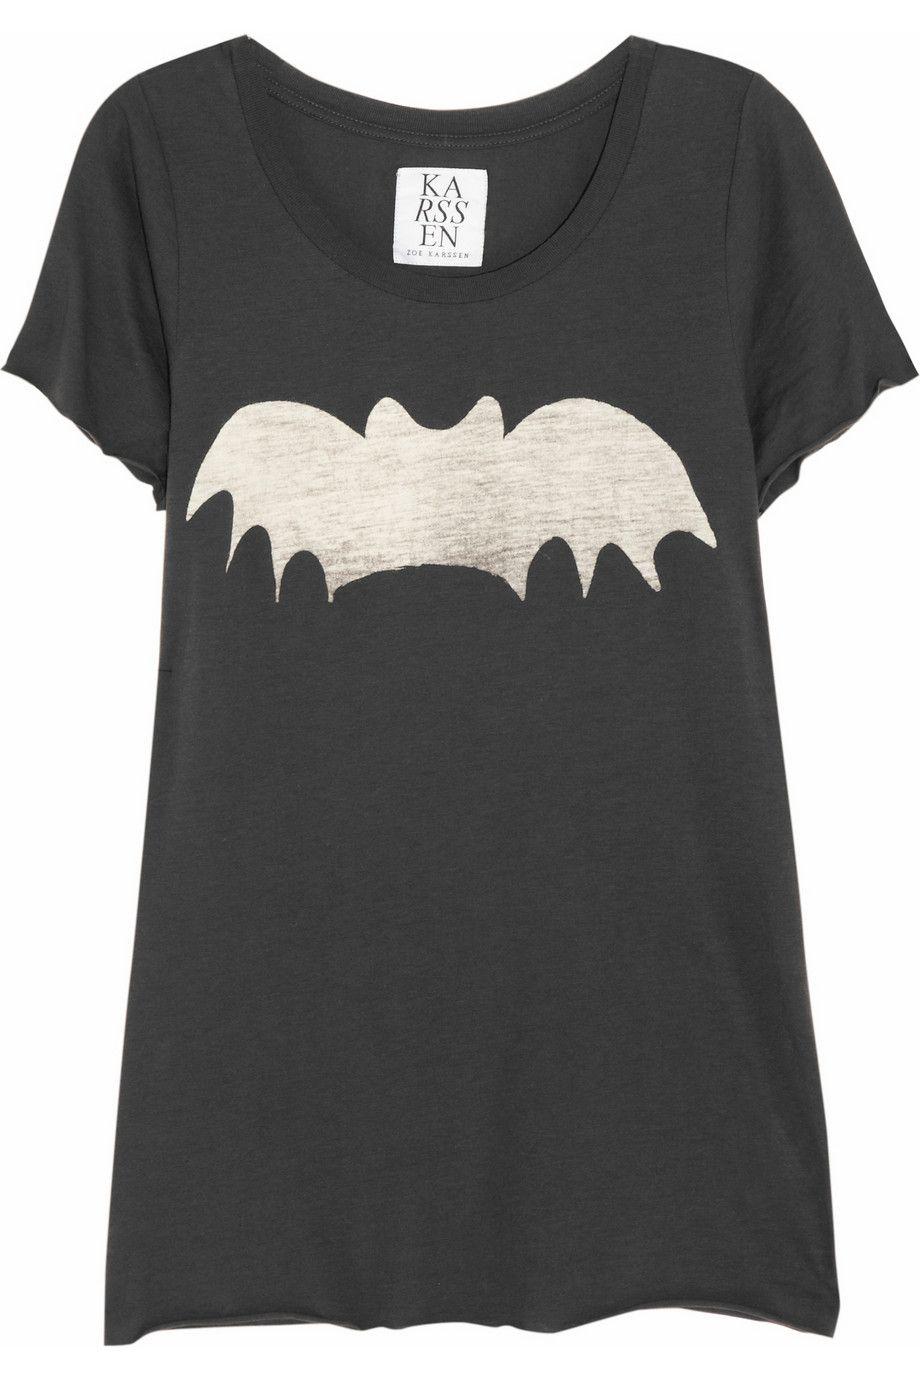 Beautiful Halloween Woman Mask Graphic Art Spider Woman Short-Sleeve Unisex T-Shirt